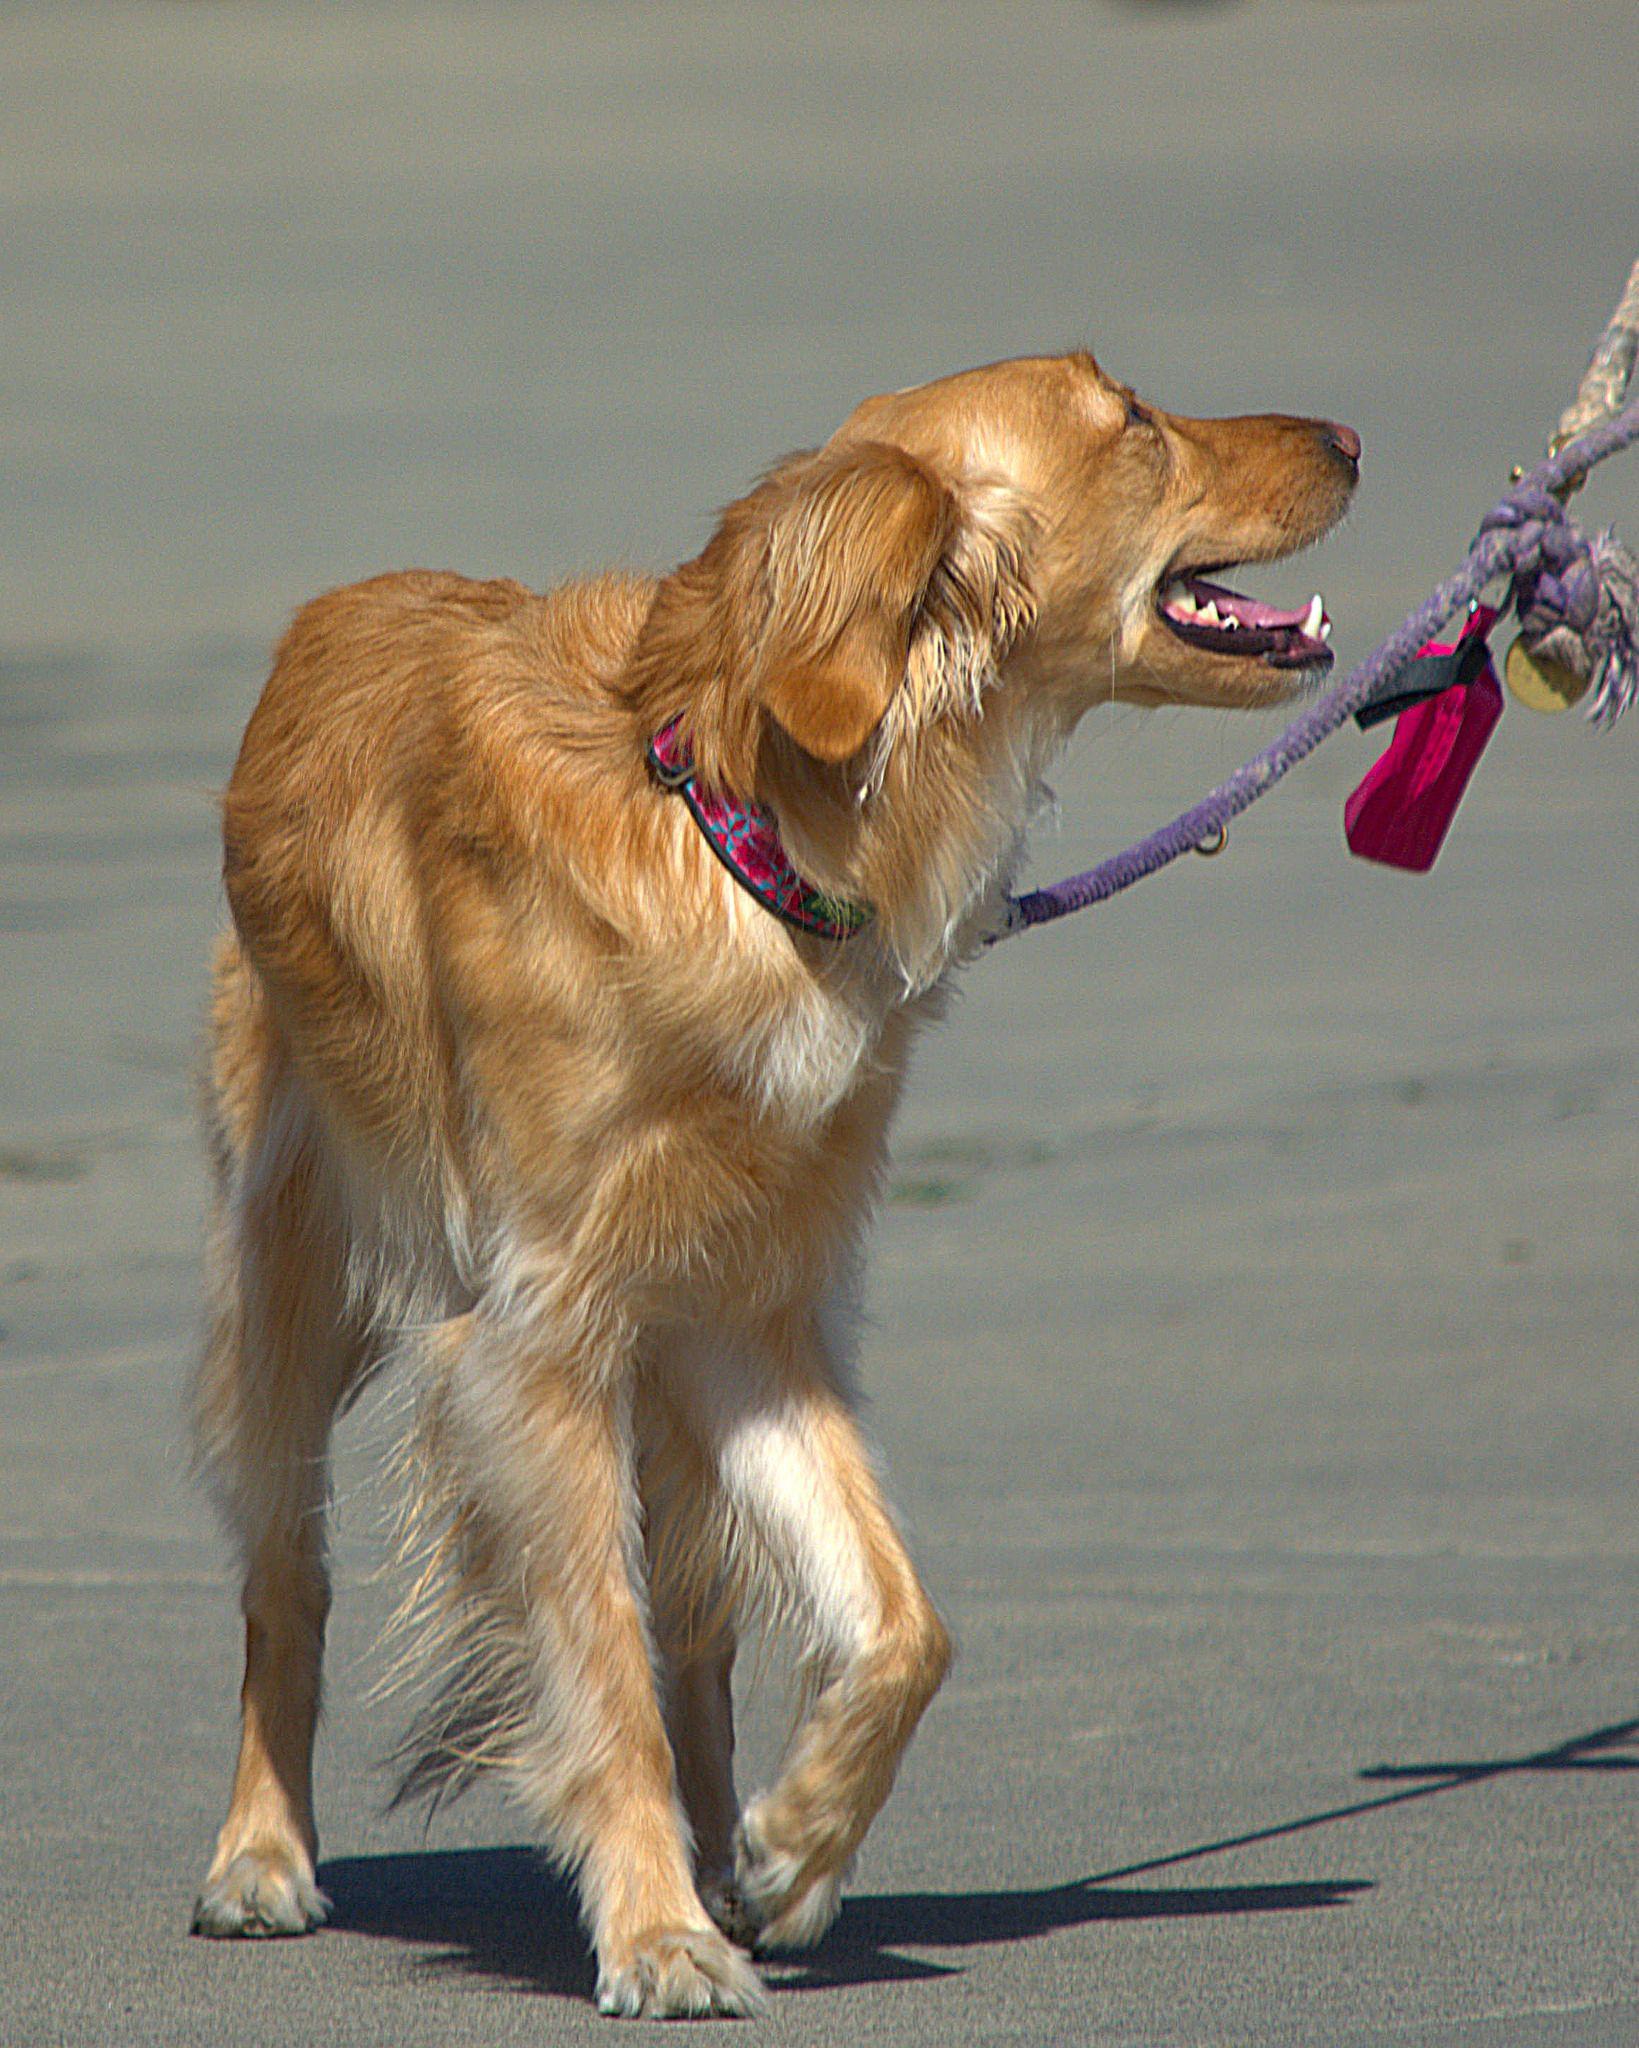 https://flic.kr/p/S9n2bi | Sweet Doggie | A beautiful animal . . .